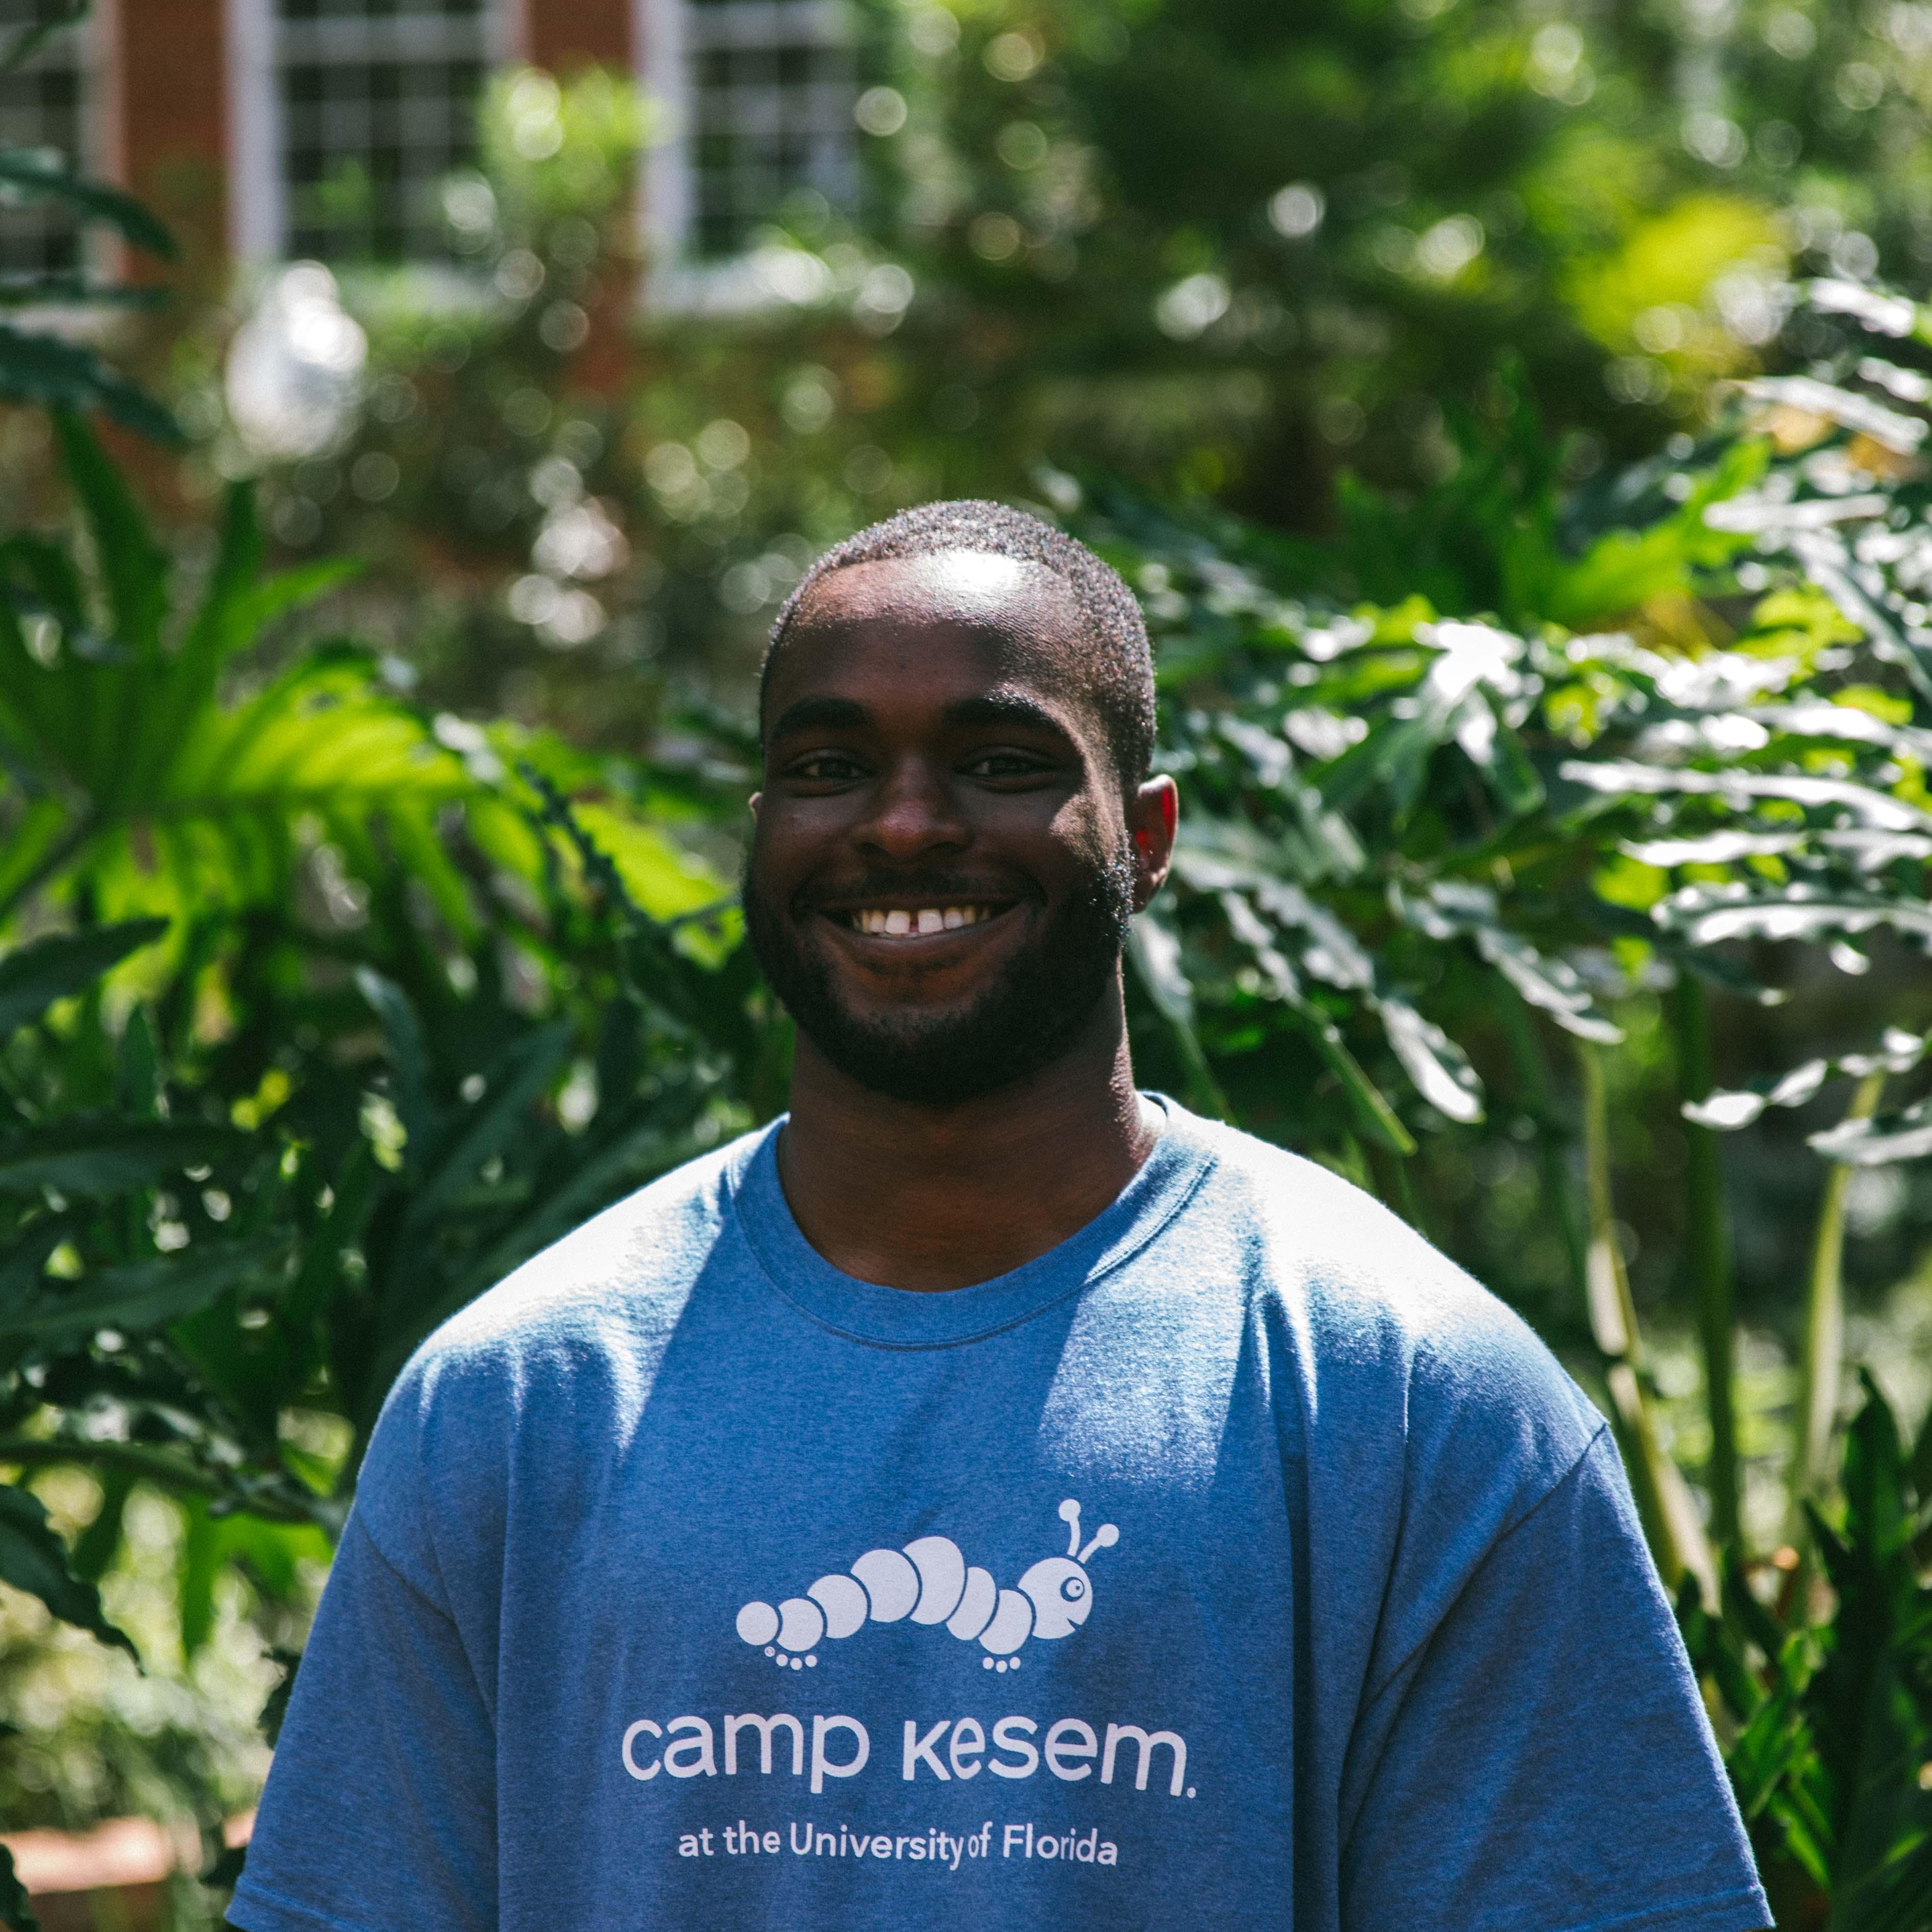 Camp Kesem at the University of Florida